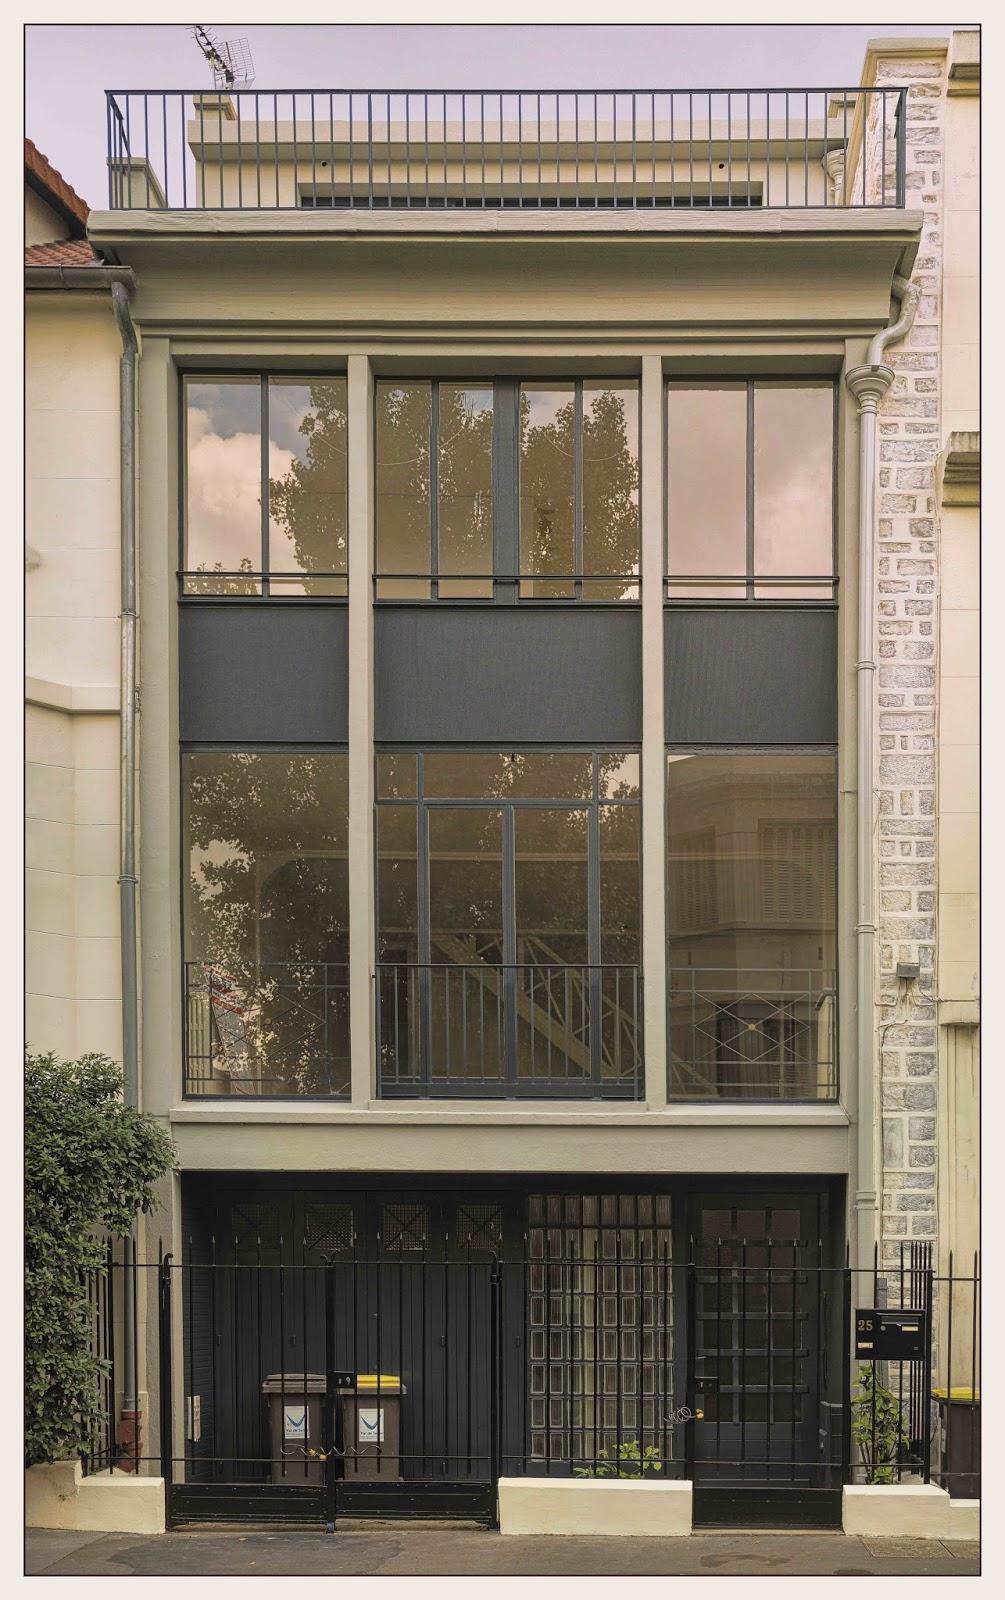 paris myope vitraux de guerre 6. Black Bedroom Furniture Sets. Home Design Ideas